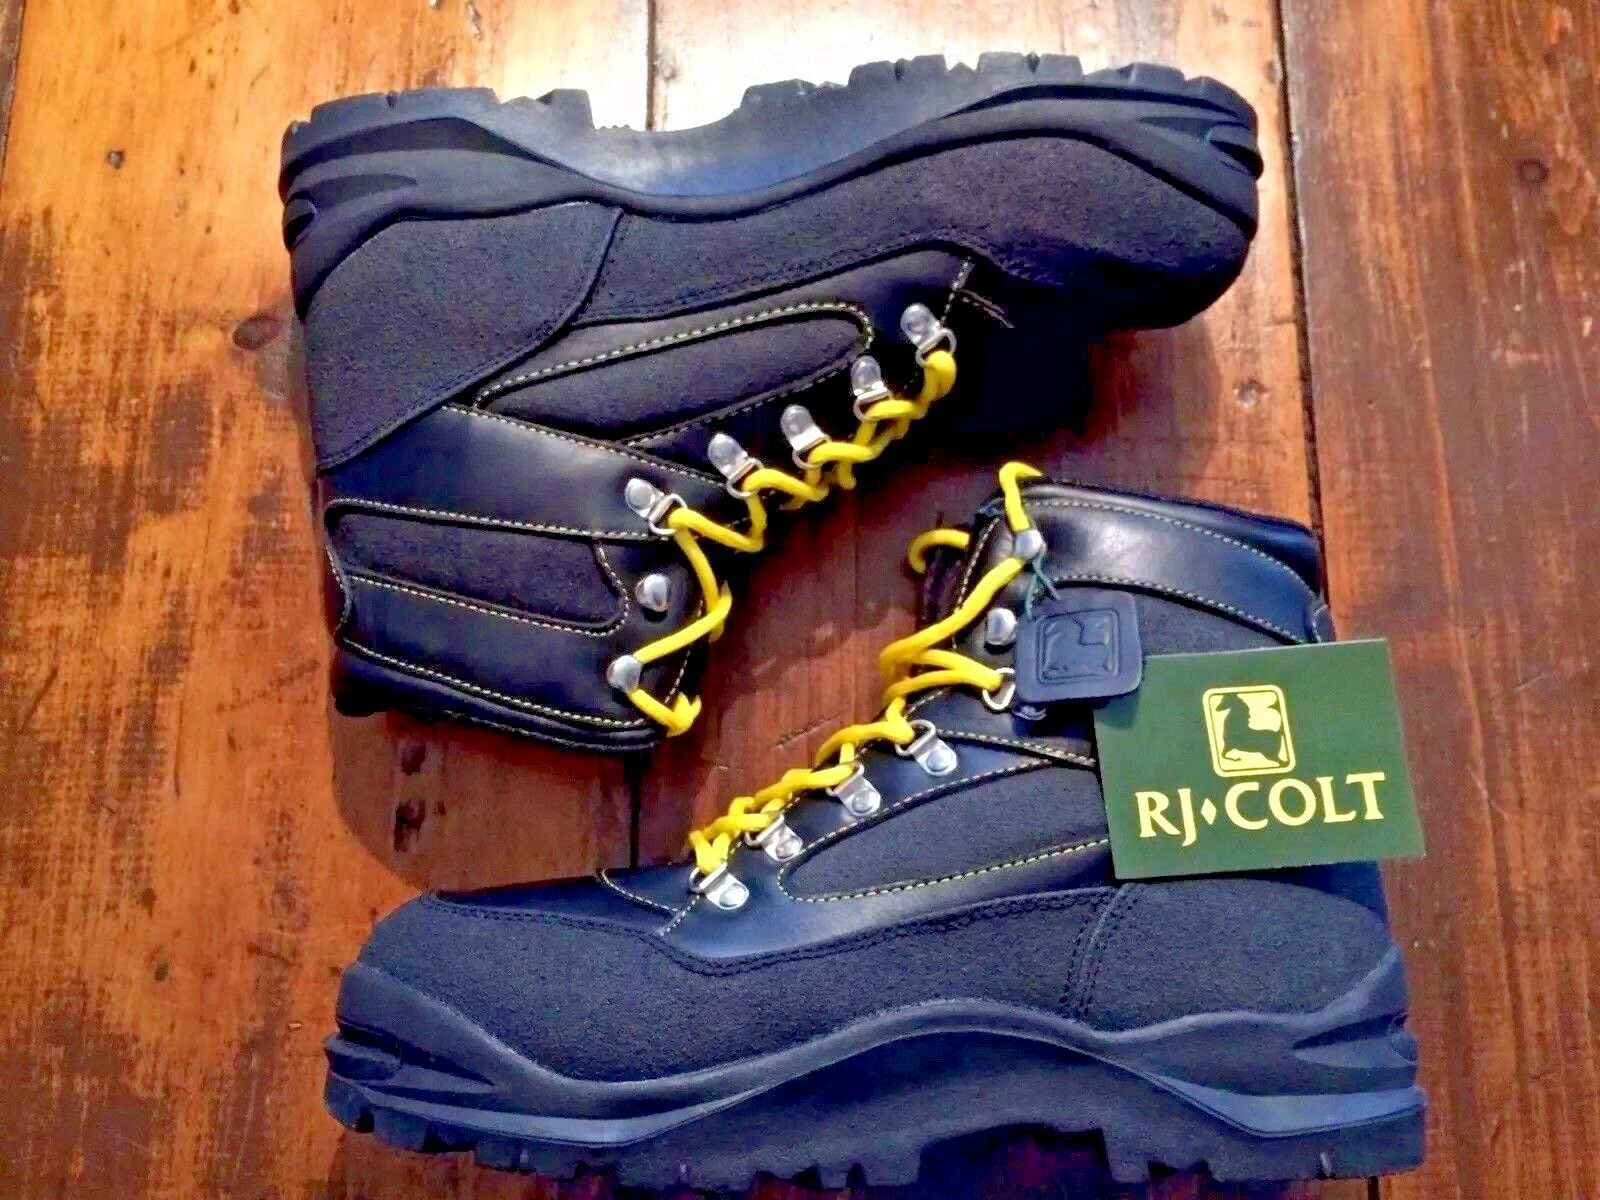 Deadstock RJ Colt Yosemite botas De Cuero Negro Nuevo en Caja de tamaño 11